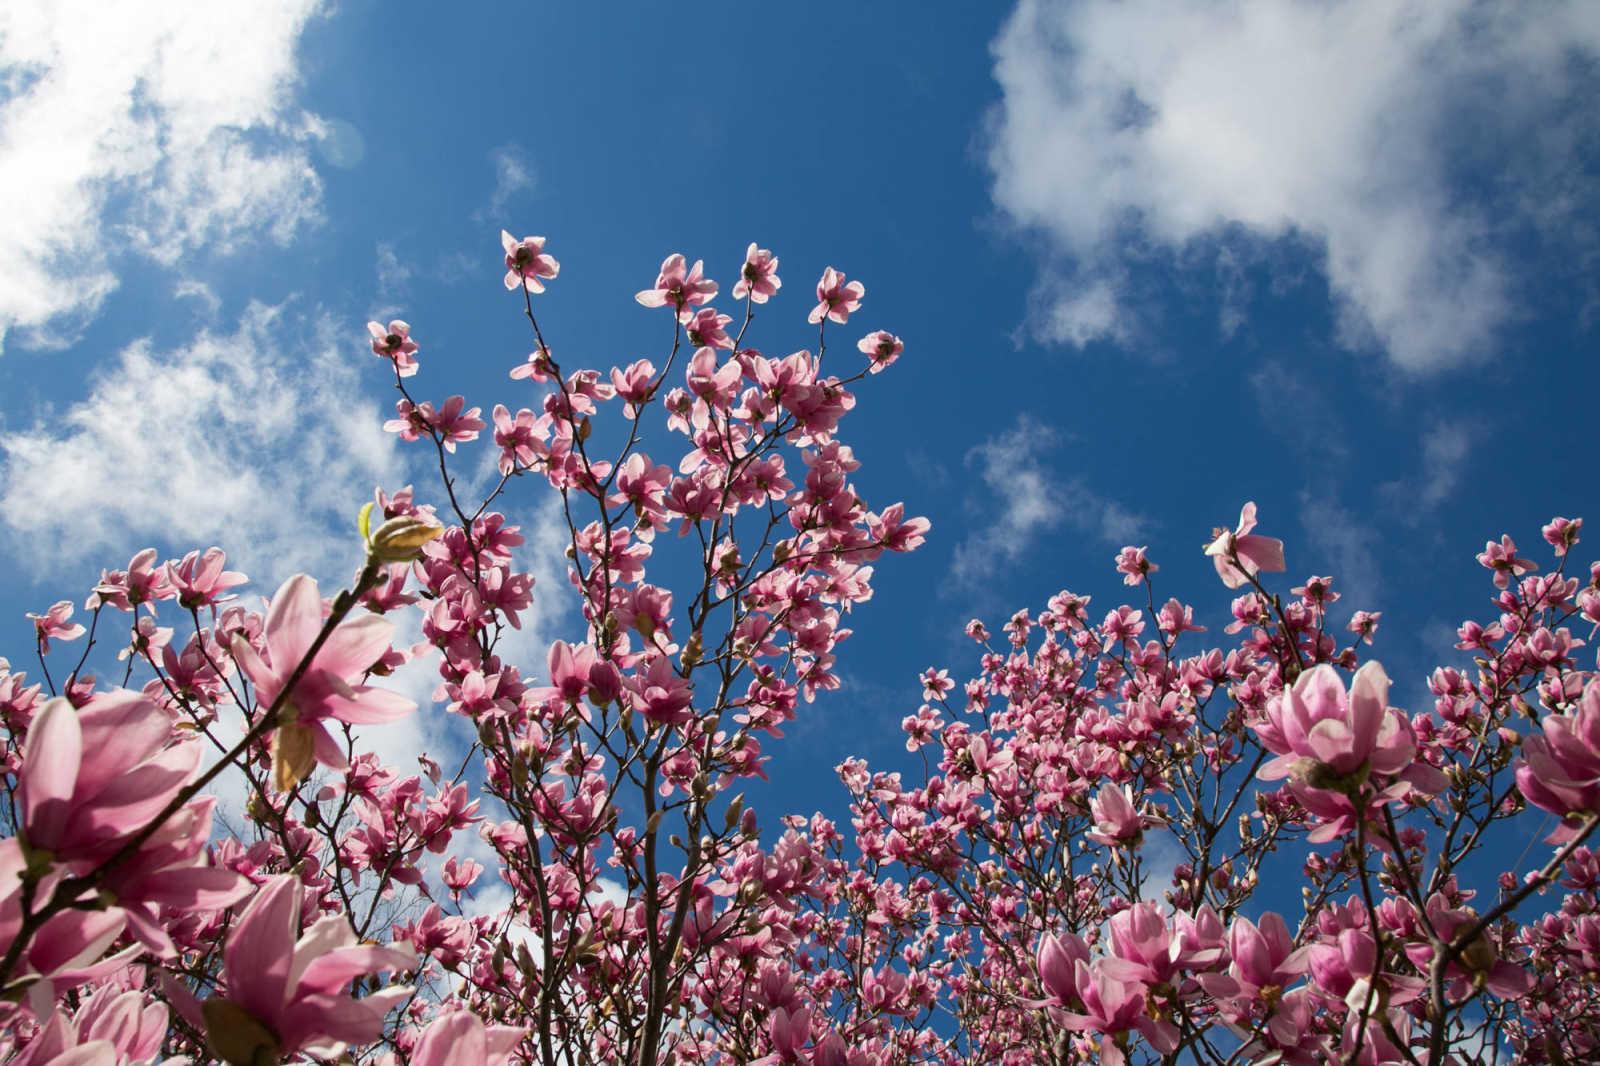 A Saucer Magnolia Tree Displays Itu0027s Blossoms In Downtown Cape Girardeau  Sunday, March 13, 2016. (Glenn Landberg)